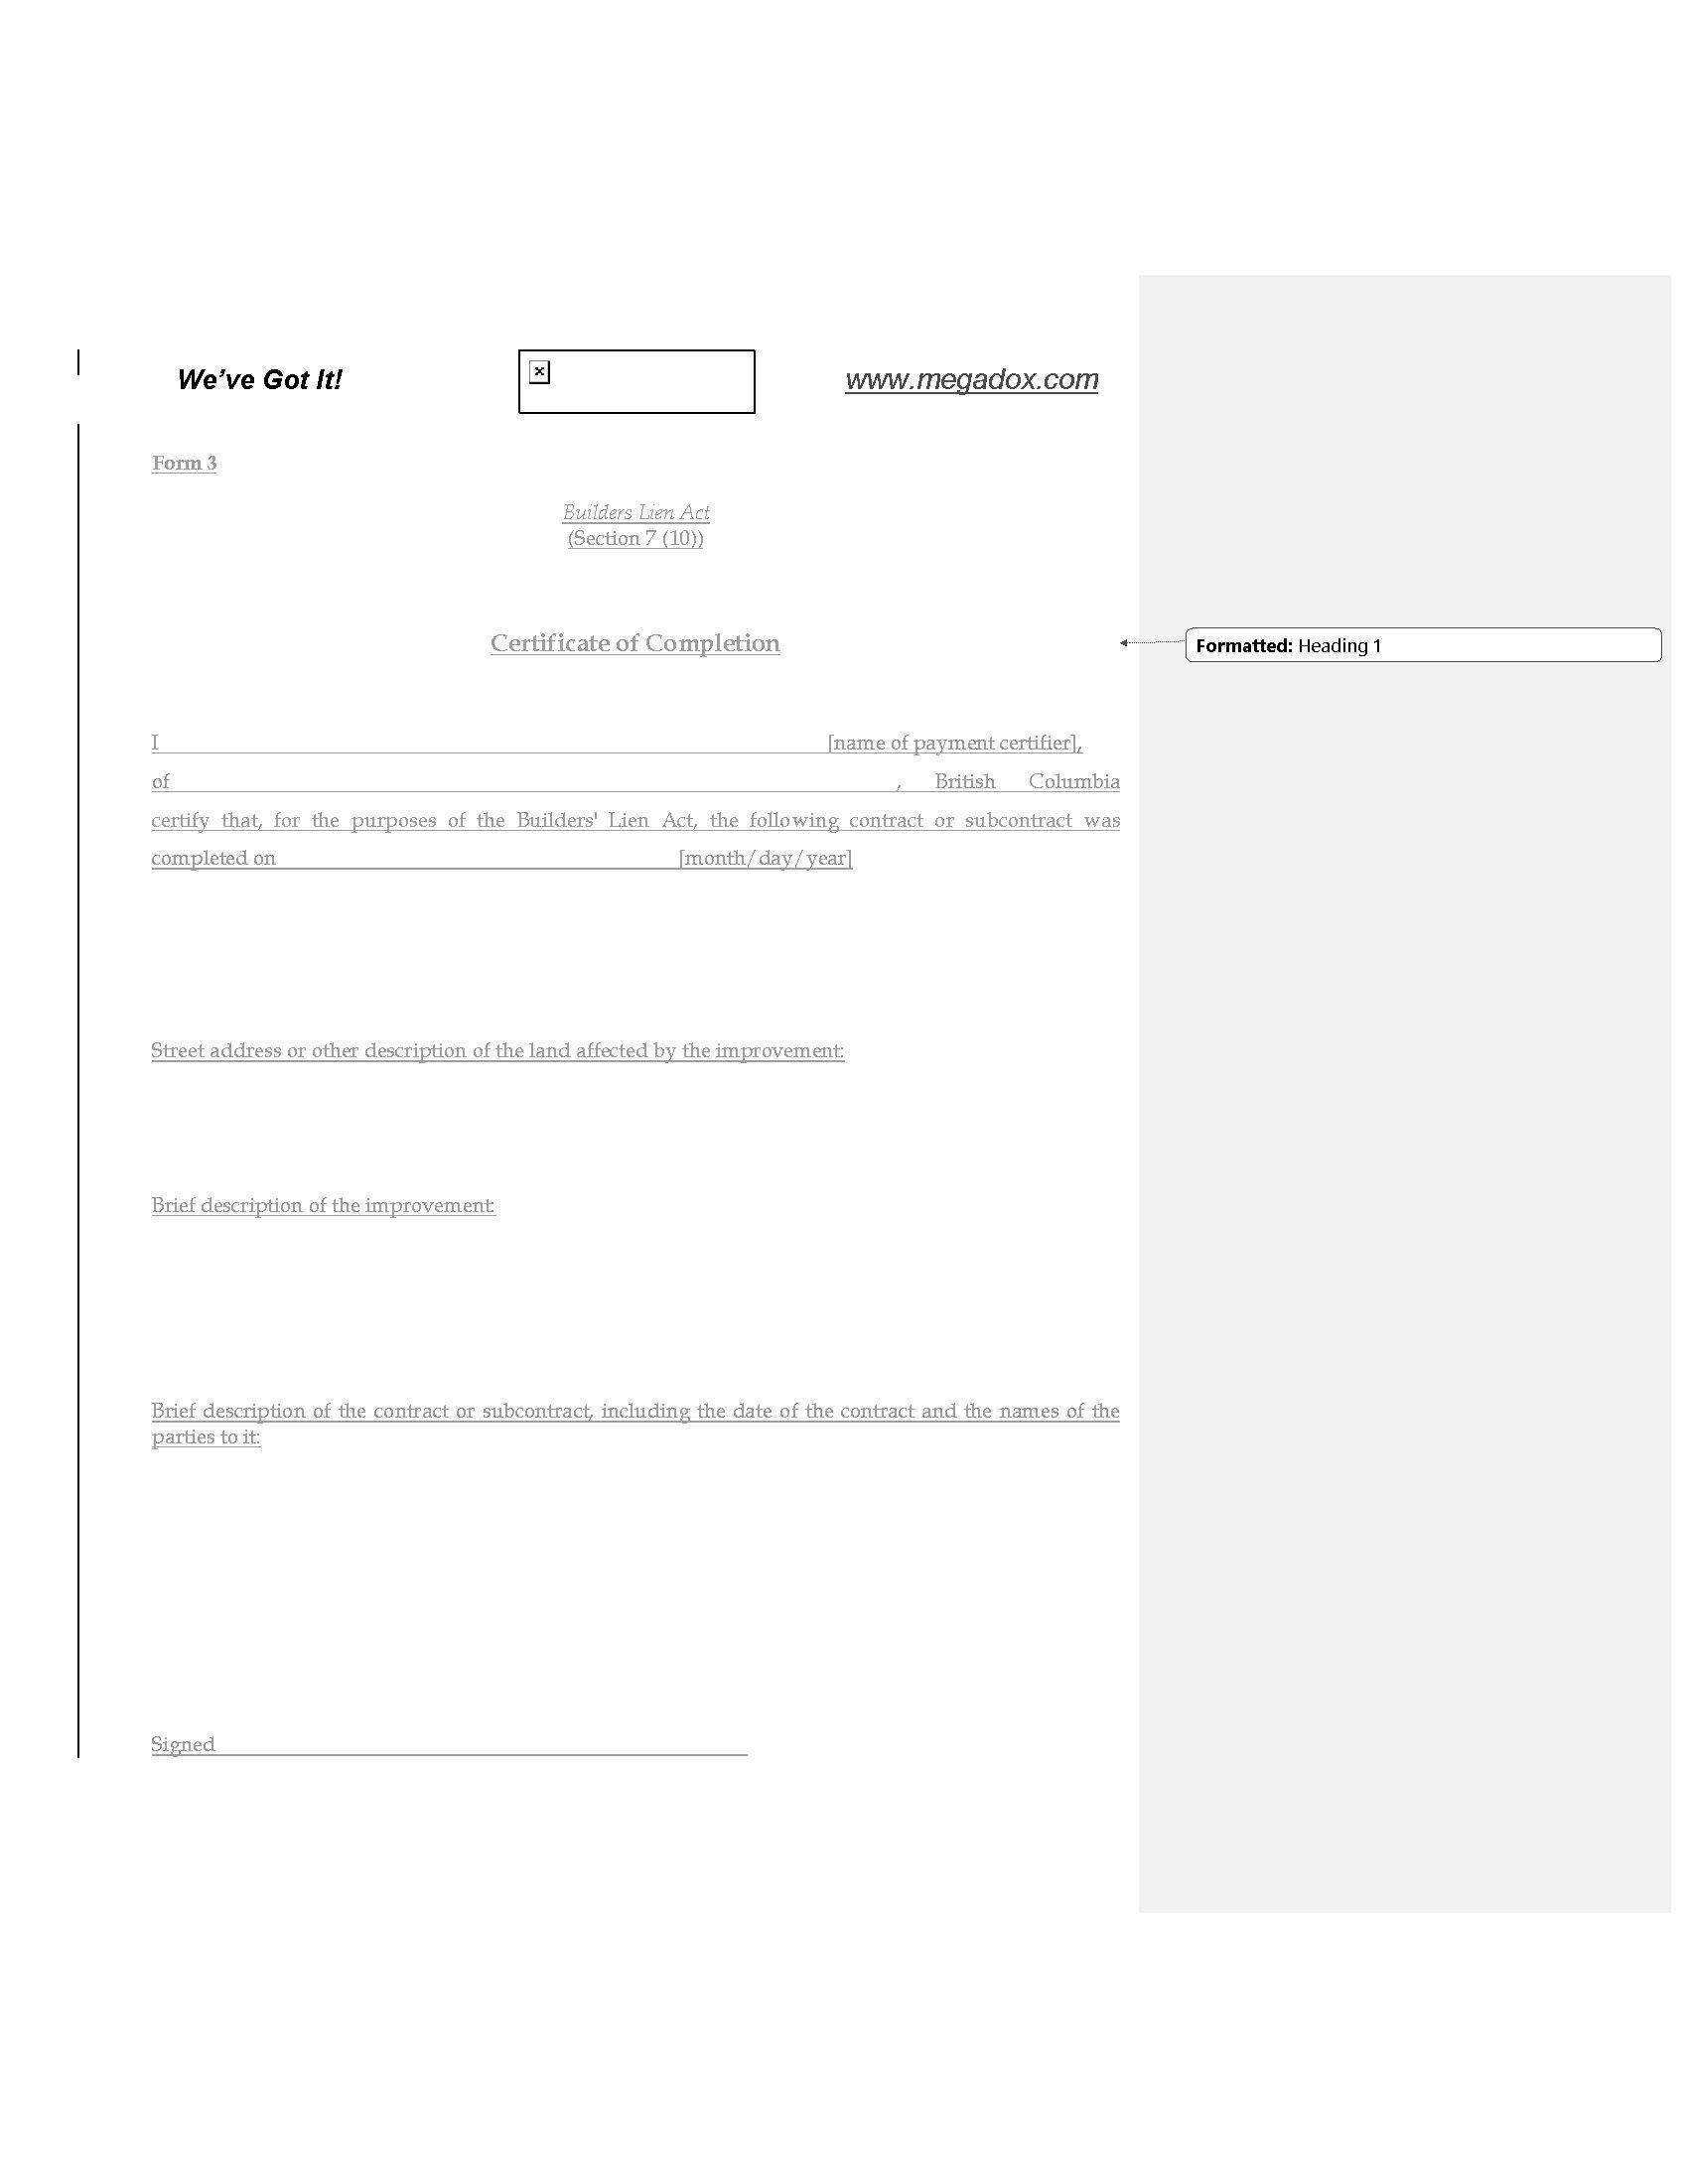 British columbia builders lien act form 3 certificate of picture of british columbia builders lien act form 3 certificate of completion yelopaper Choice Image